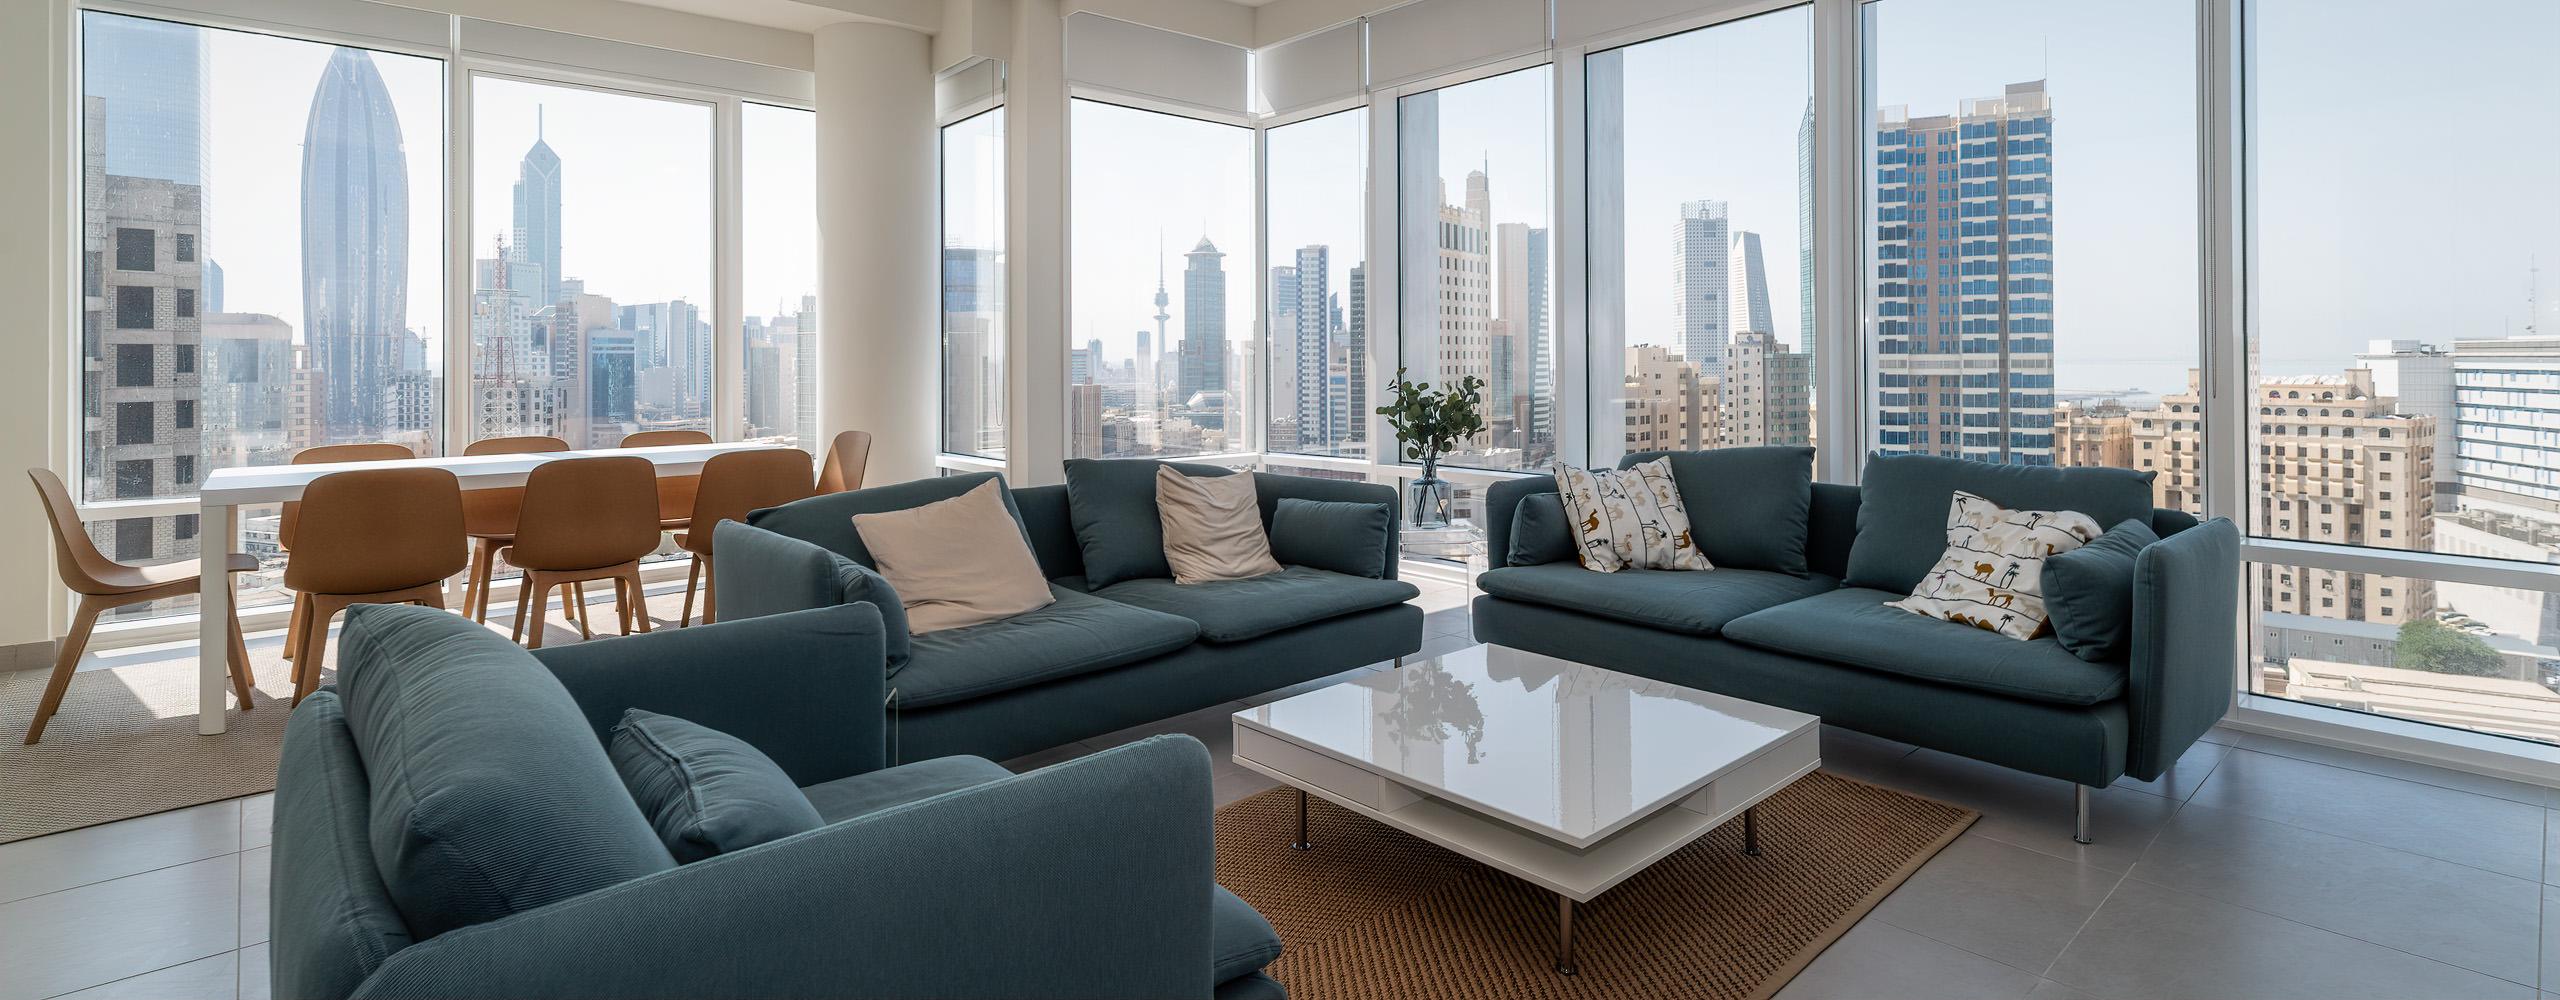 Dasman – new, elegant two and three bedroom apartments w/sea view